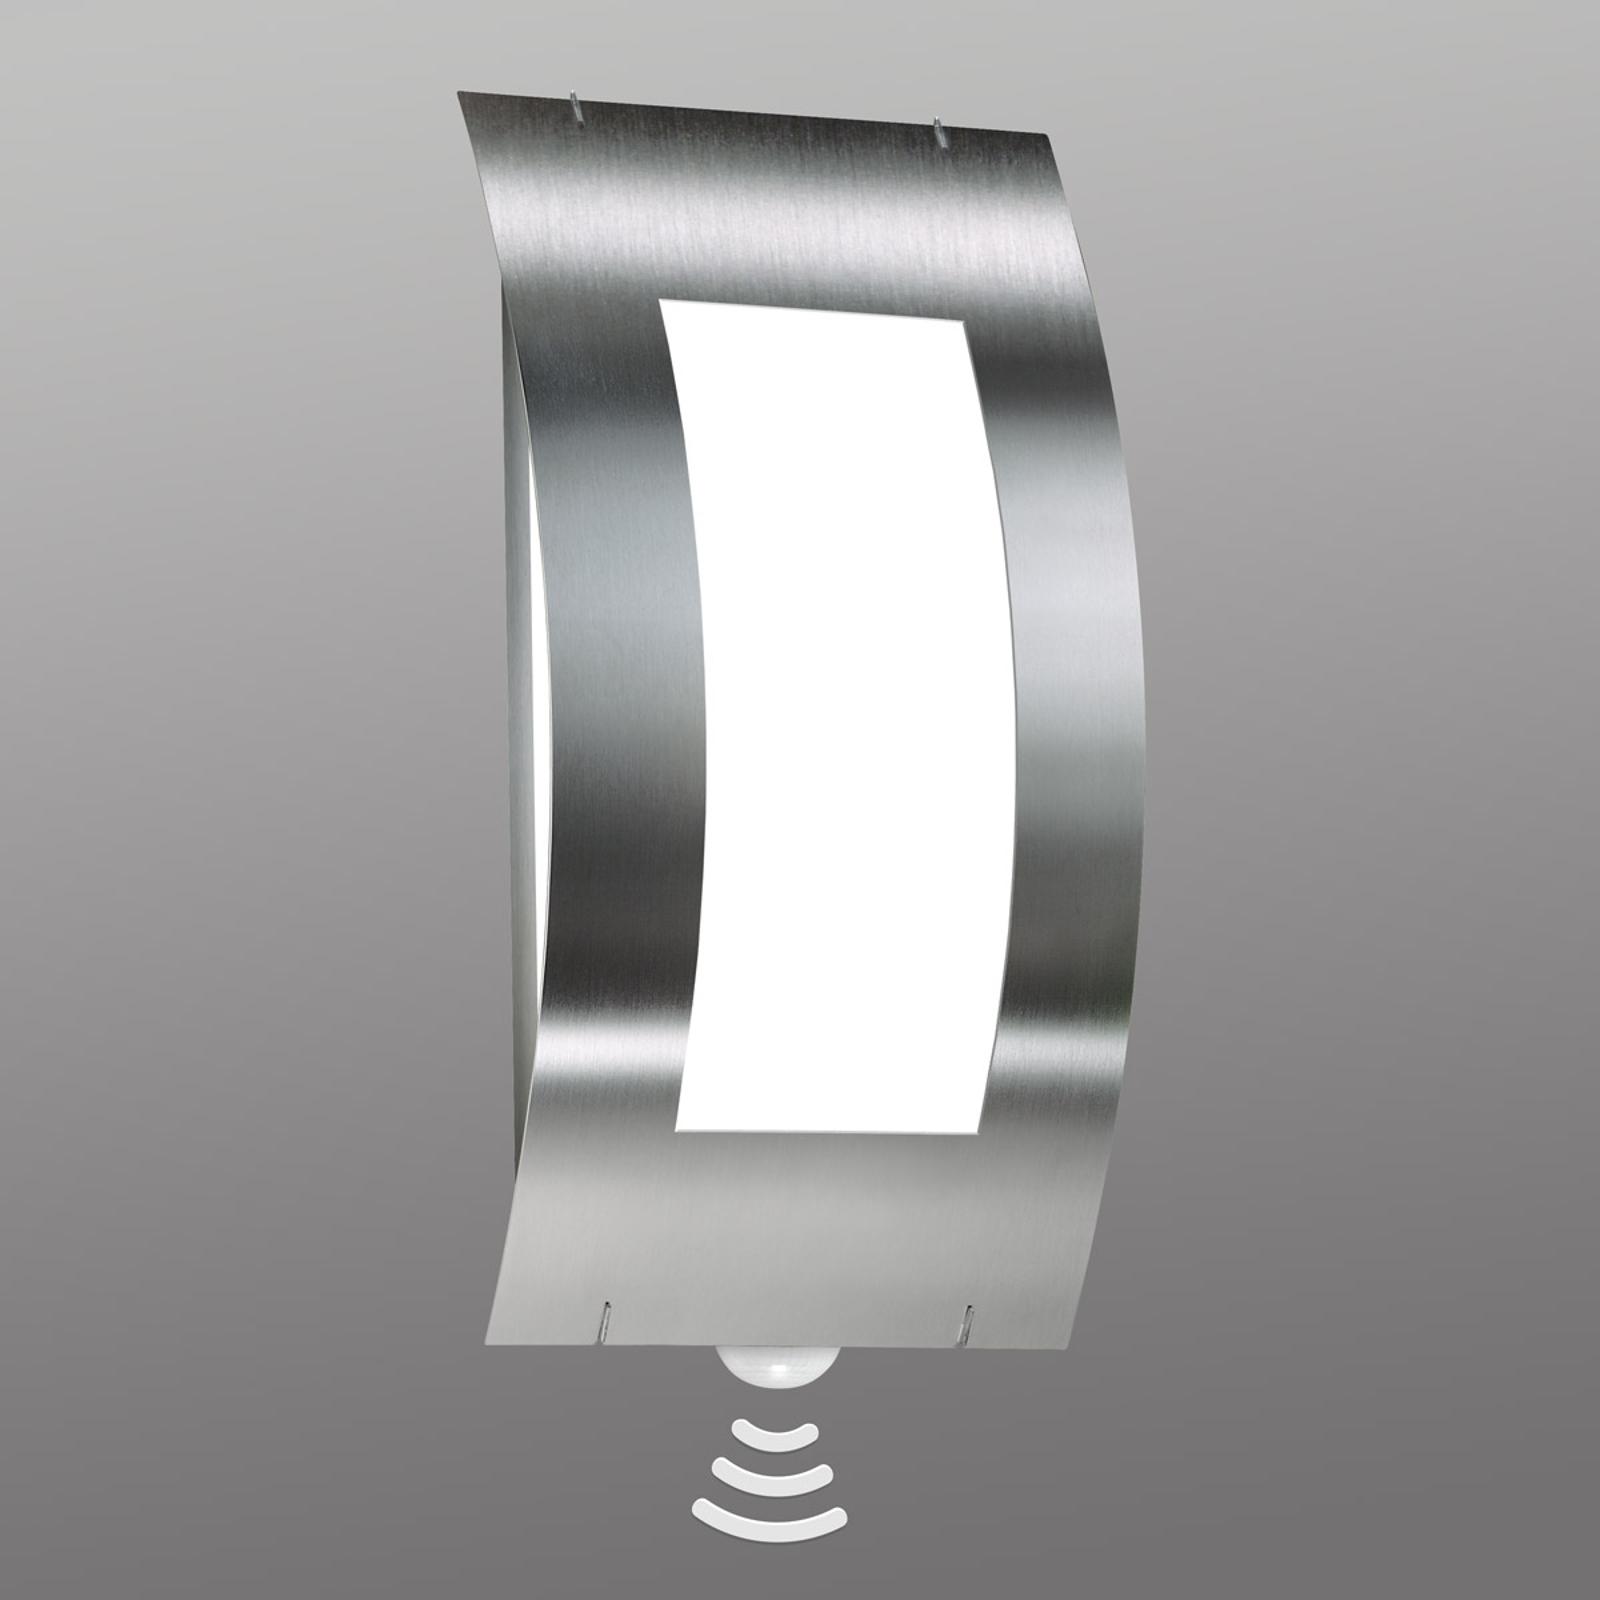 Mooie buitenwandlamp Quadrat met sensor